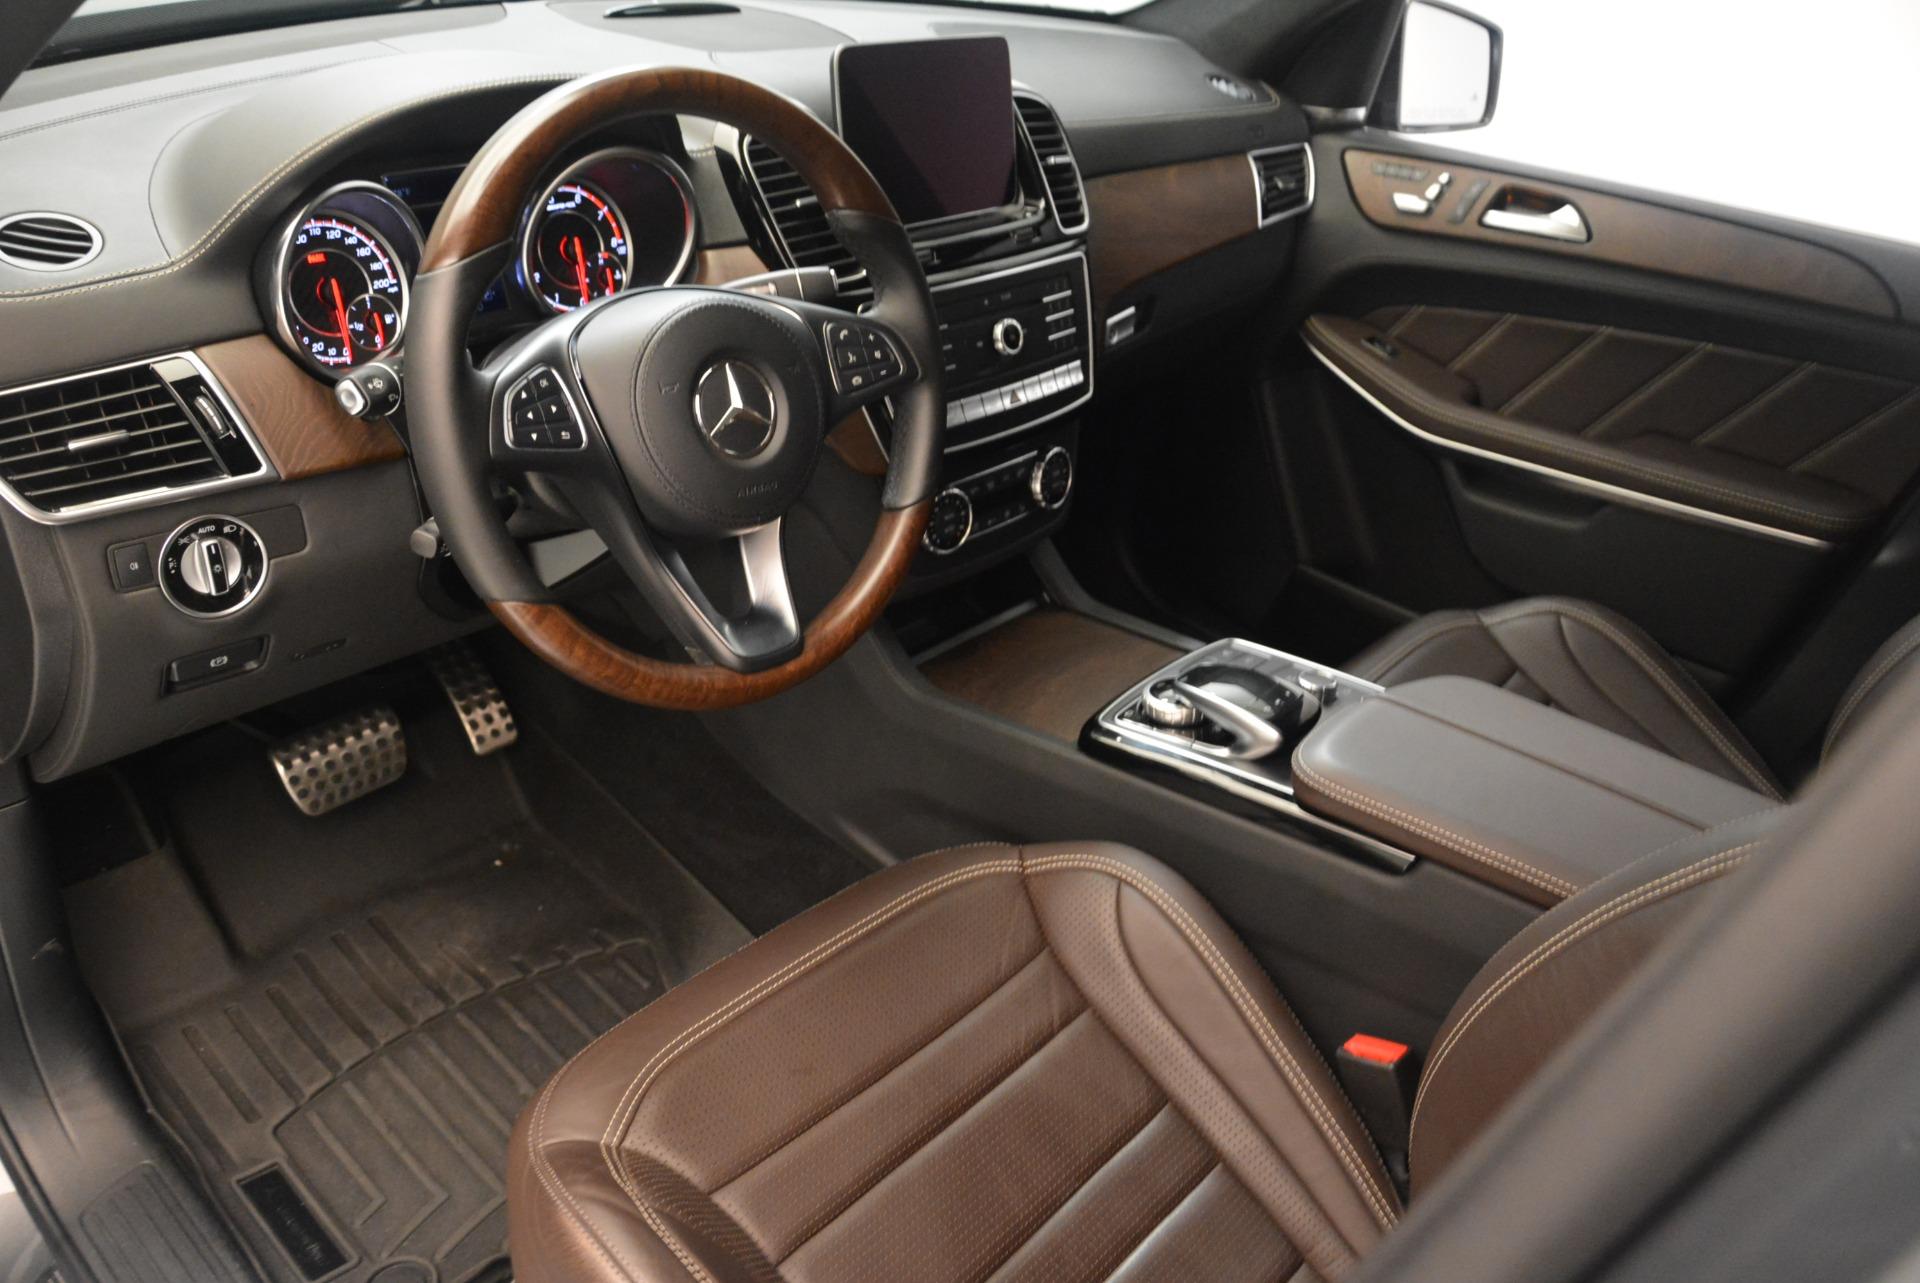 Used 2017 Mercedes-Benz GLS AMG GLS 63 For Sale In Westport, CT 2518_p14